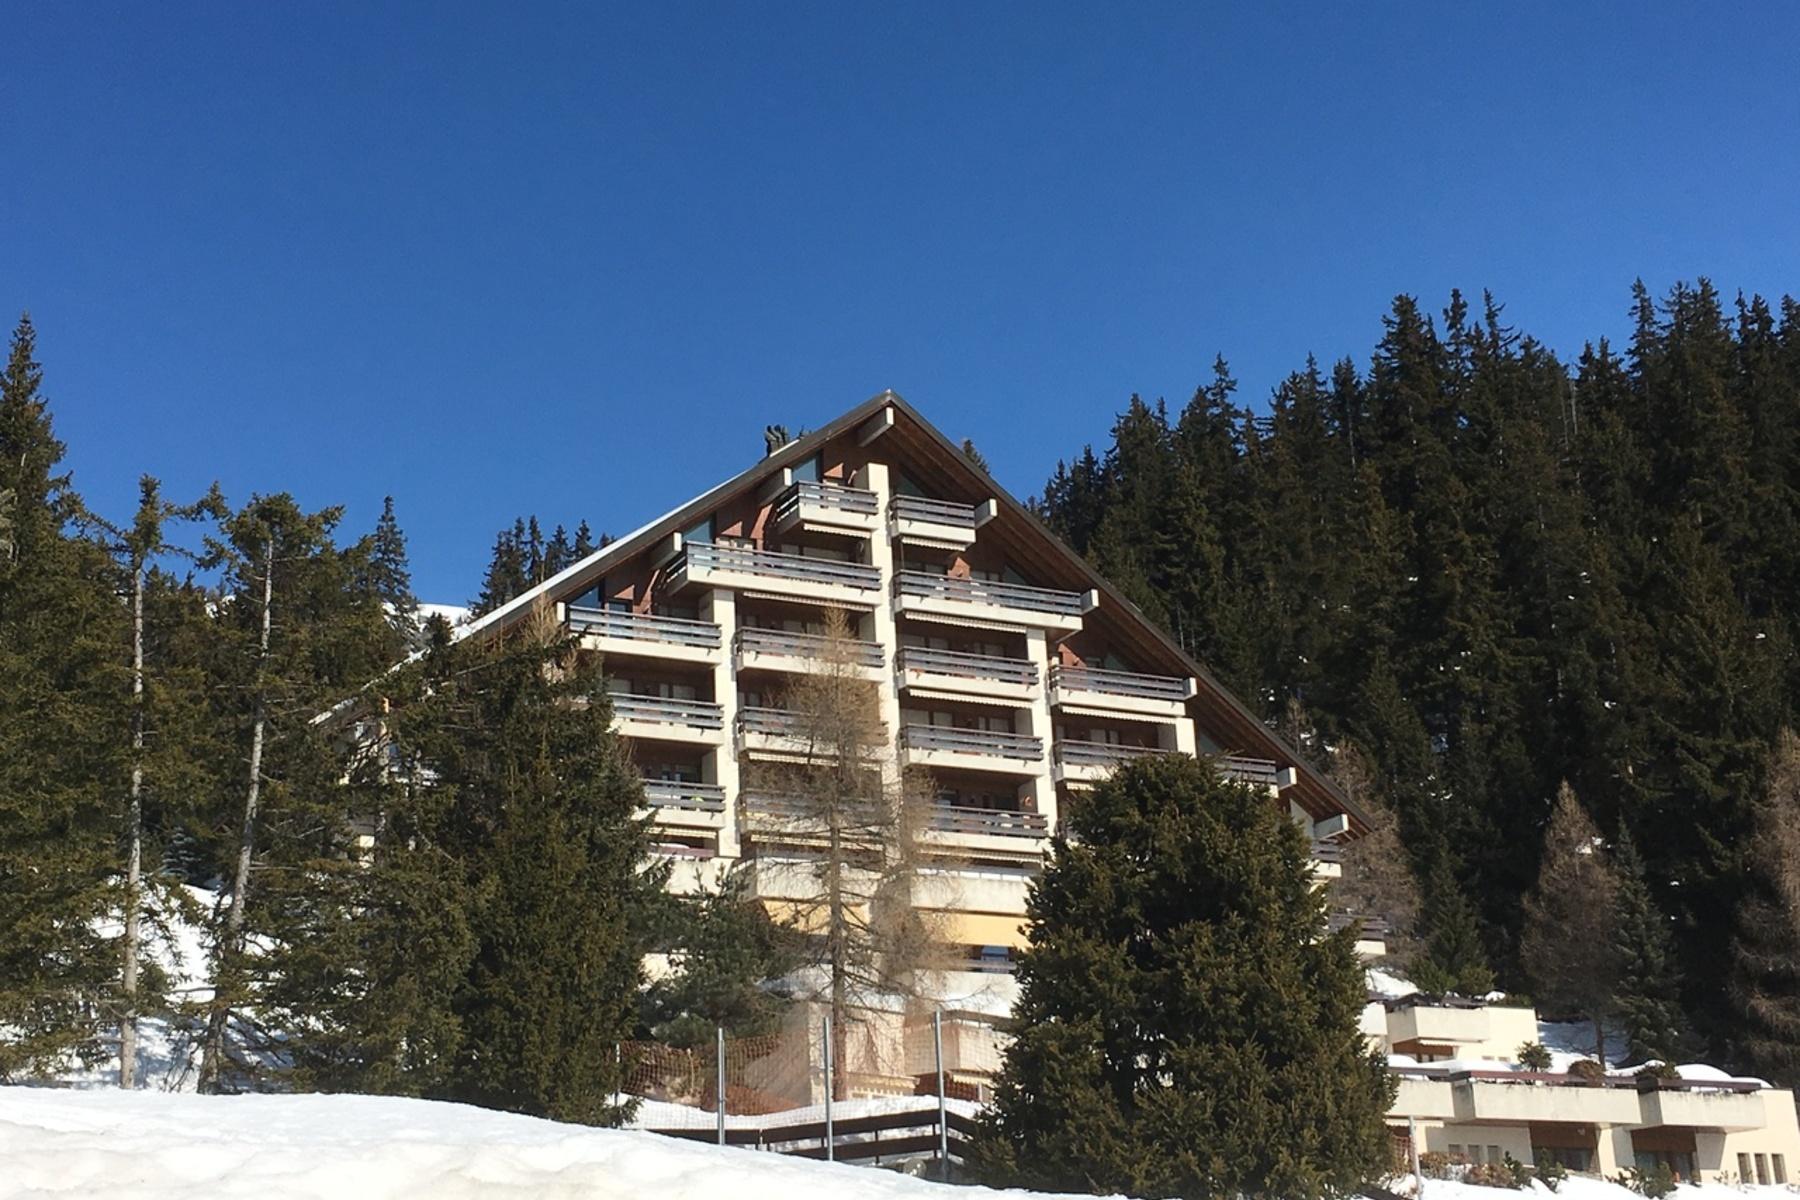 Apartamento para Venda às Arnouvaz, 5 rooms in triplex Rue du Zotzet Crans, Valais, 3963 Suíça